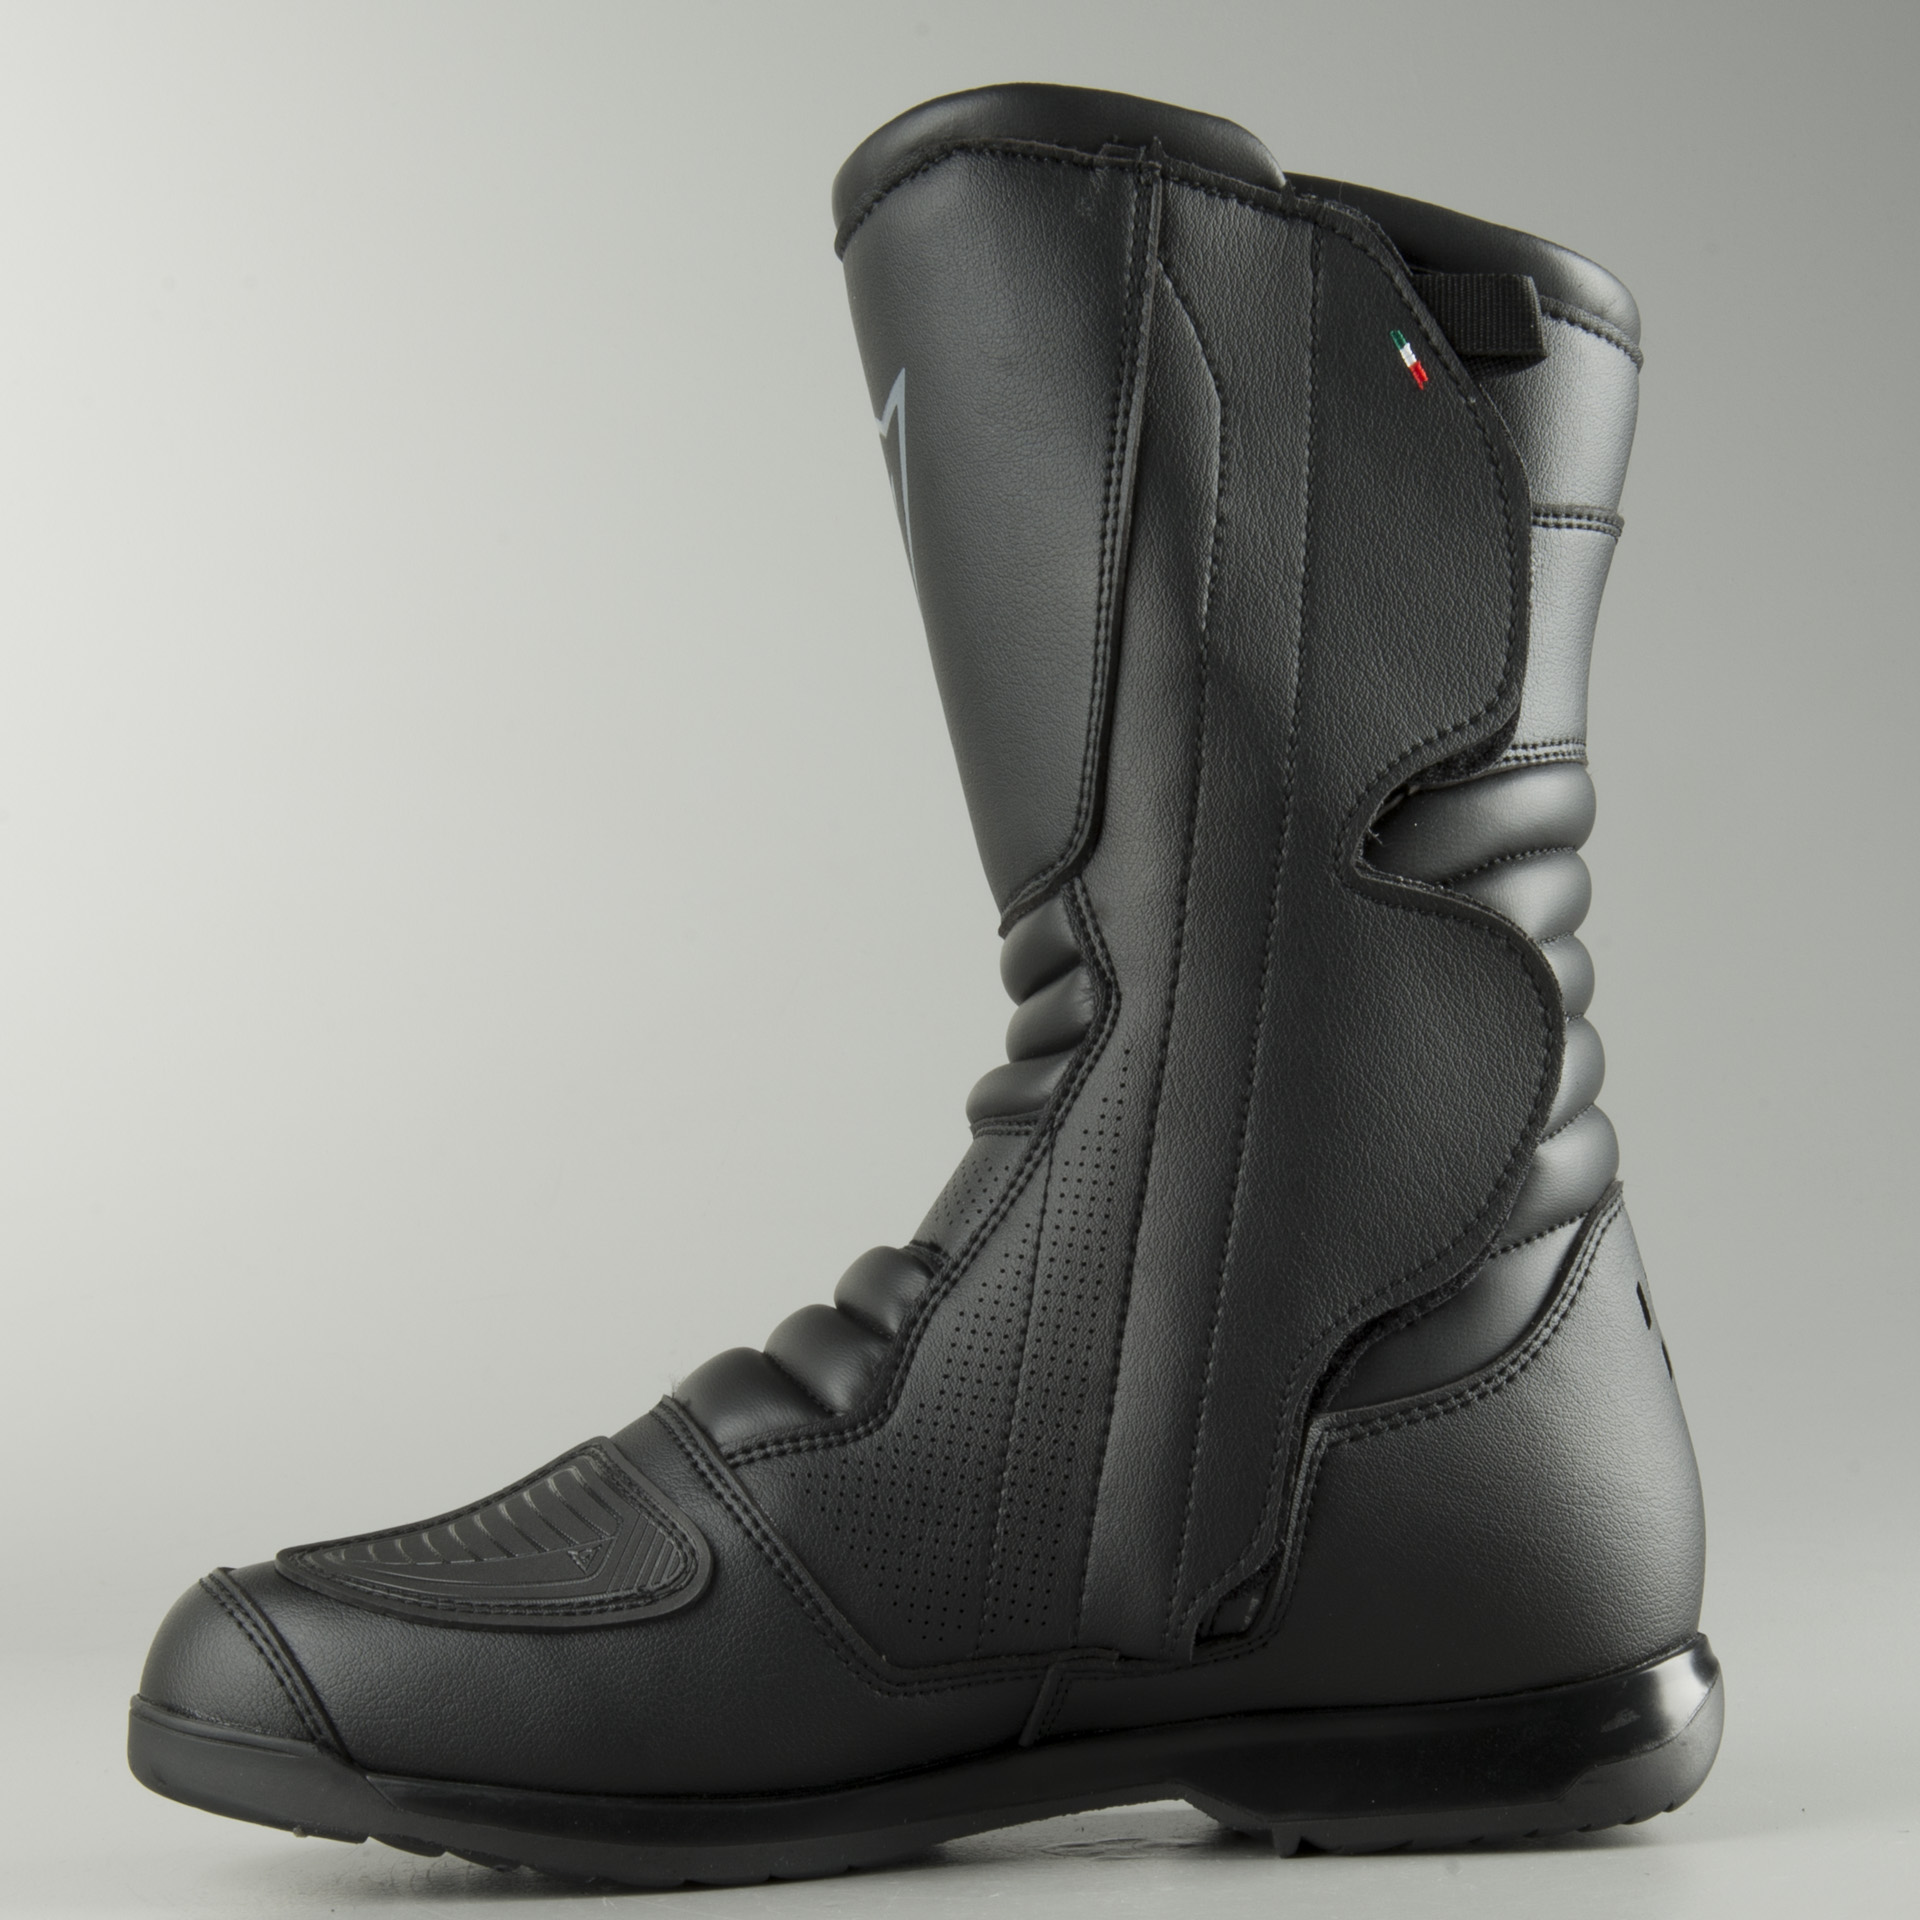 Gore Freeland Tex Boots Dainese Black 1cFJ3KTul